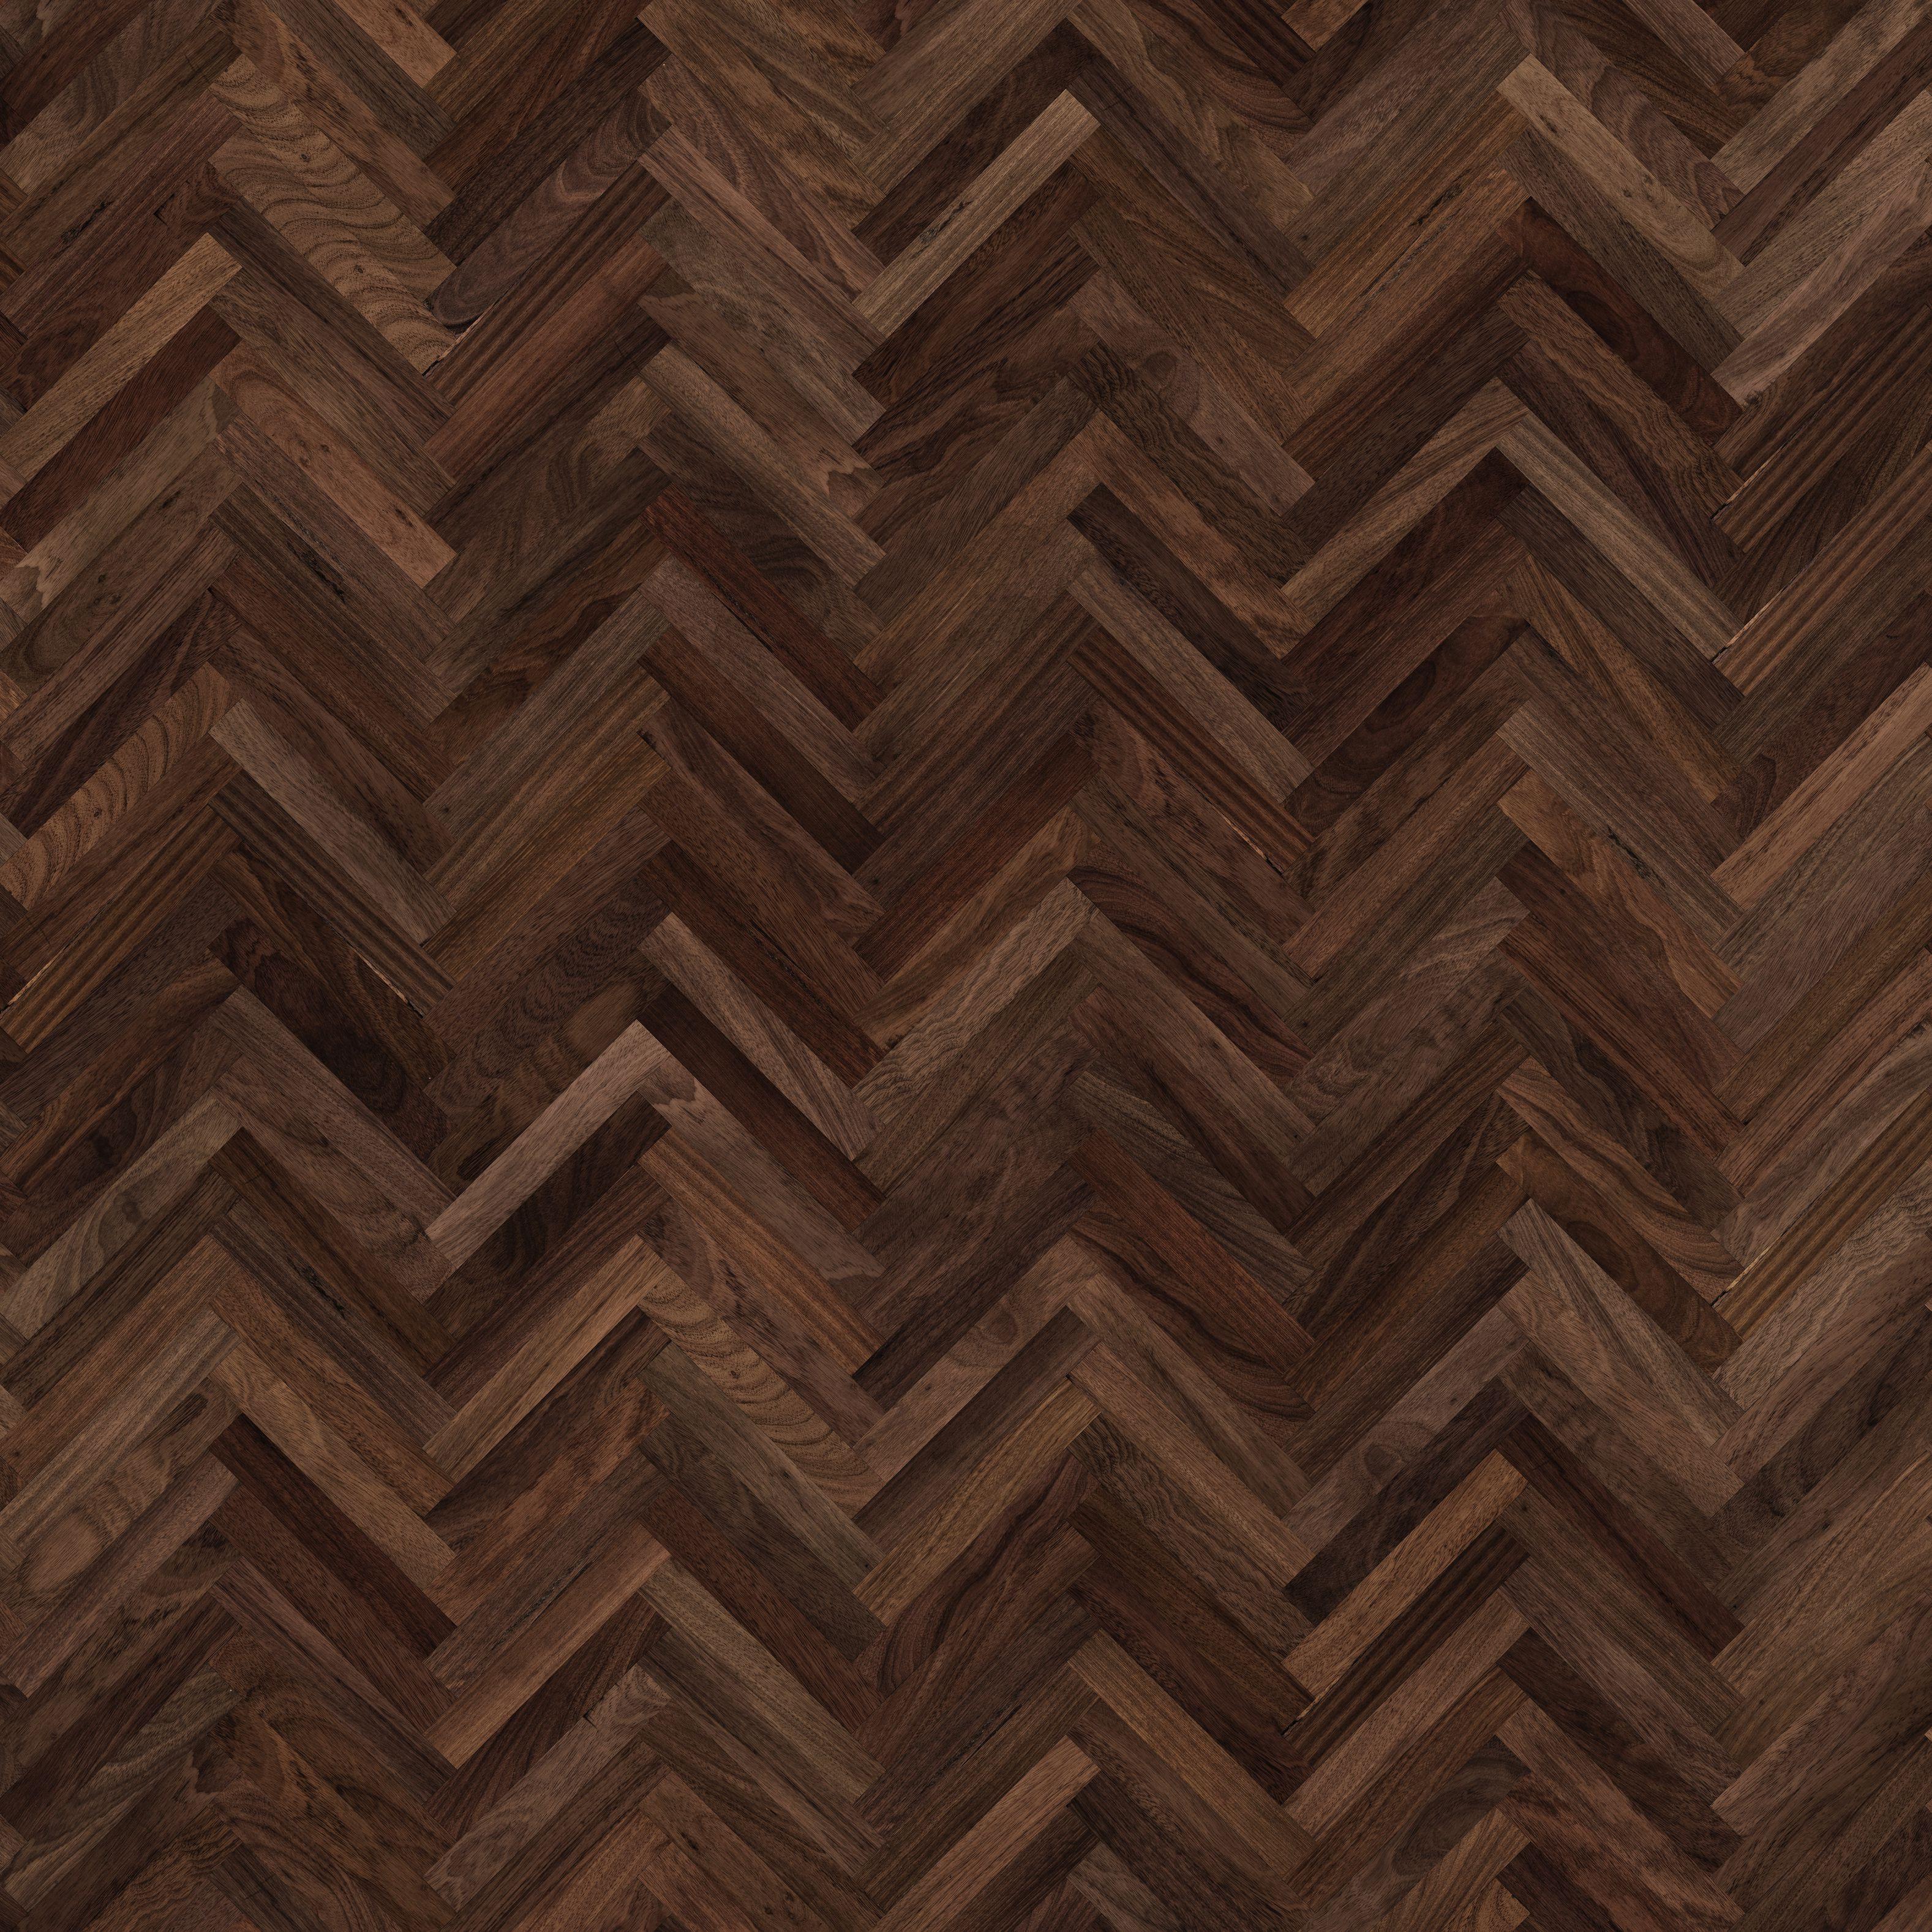 bamboo engineered hardwood flooring of parquet wood flooring with dark brown wood background xxxl 171110782 587c06b75f9b584db316fb21